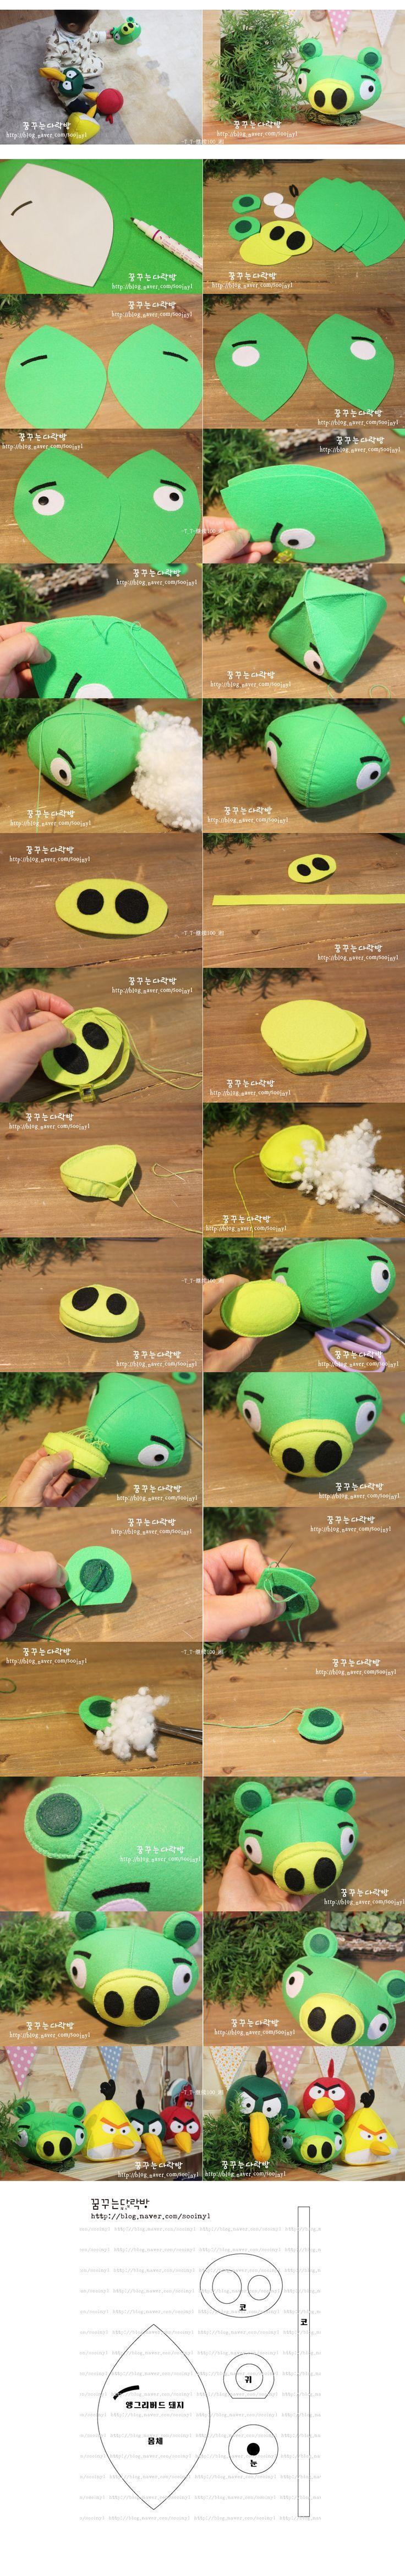 green angry bird